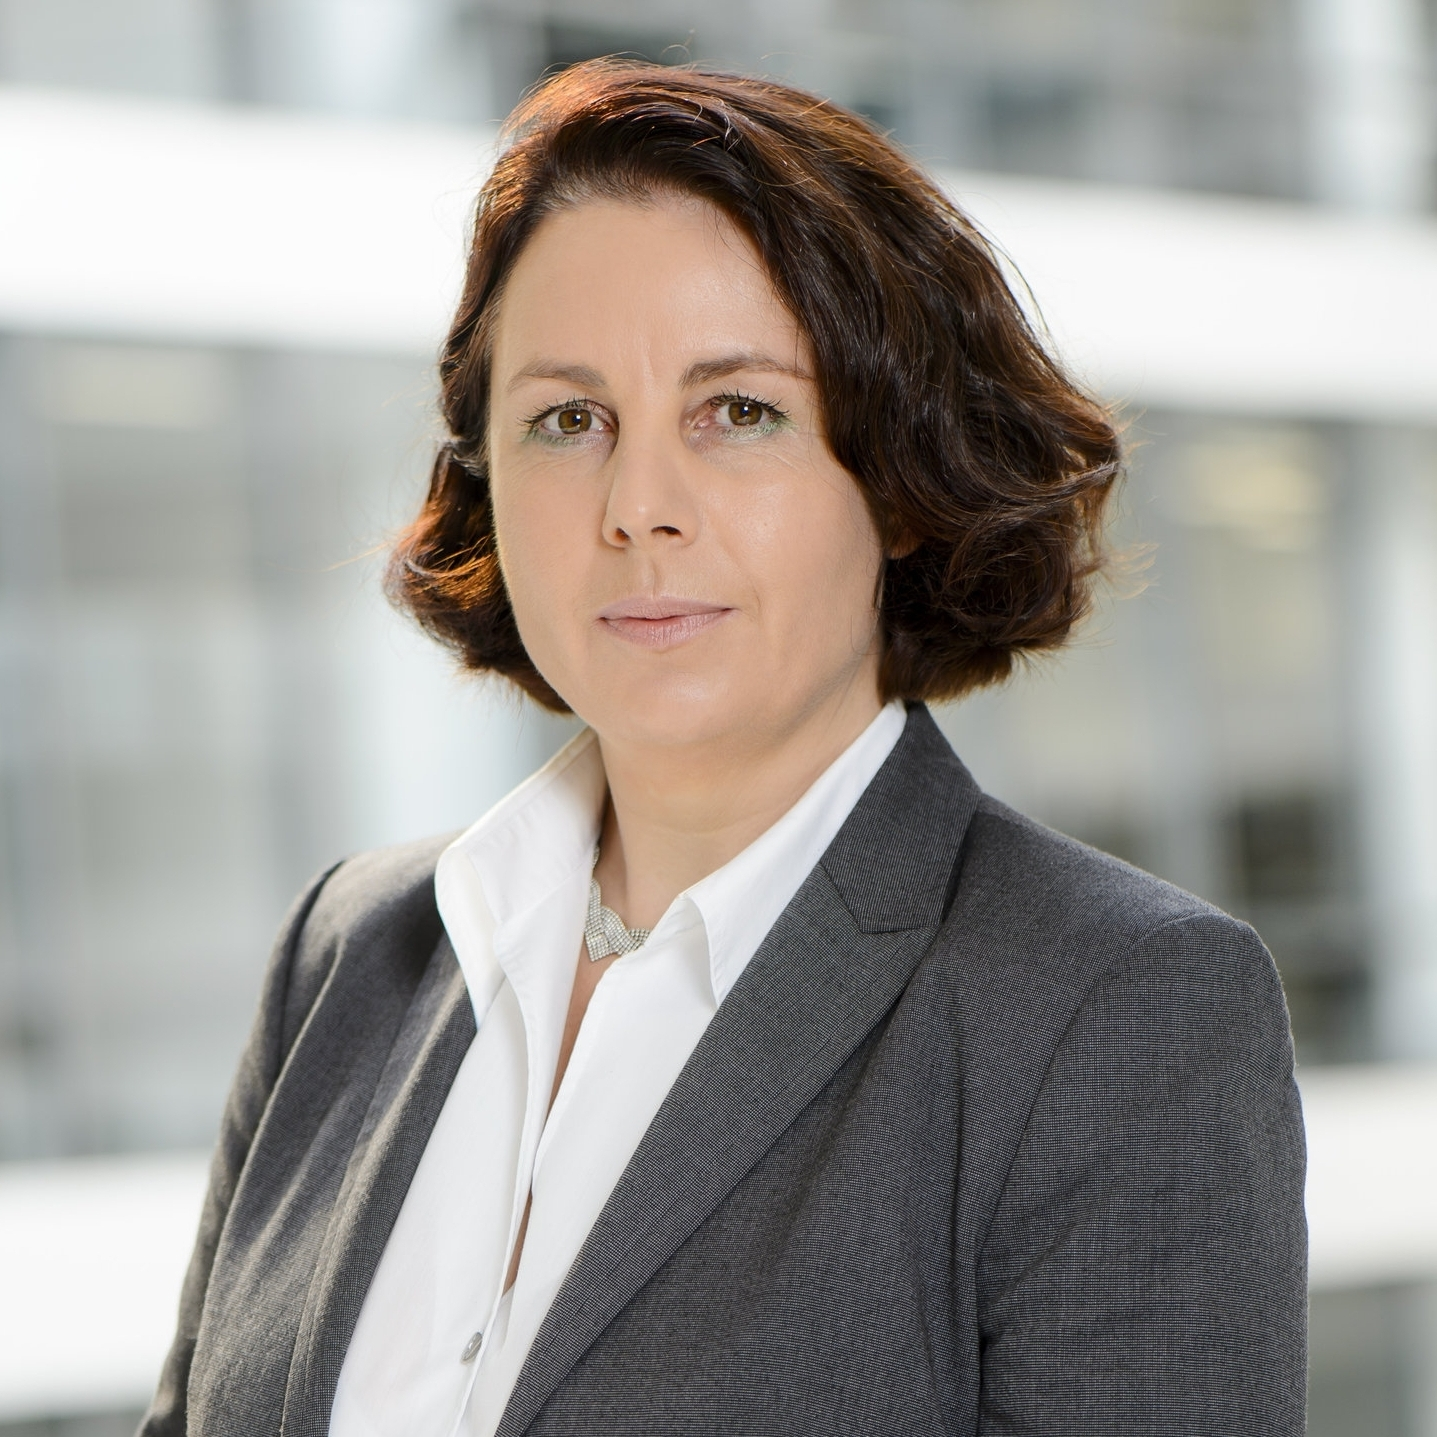 Birgit Kredel    Corporate Vice President, Head of Corporate Development Siemens One